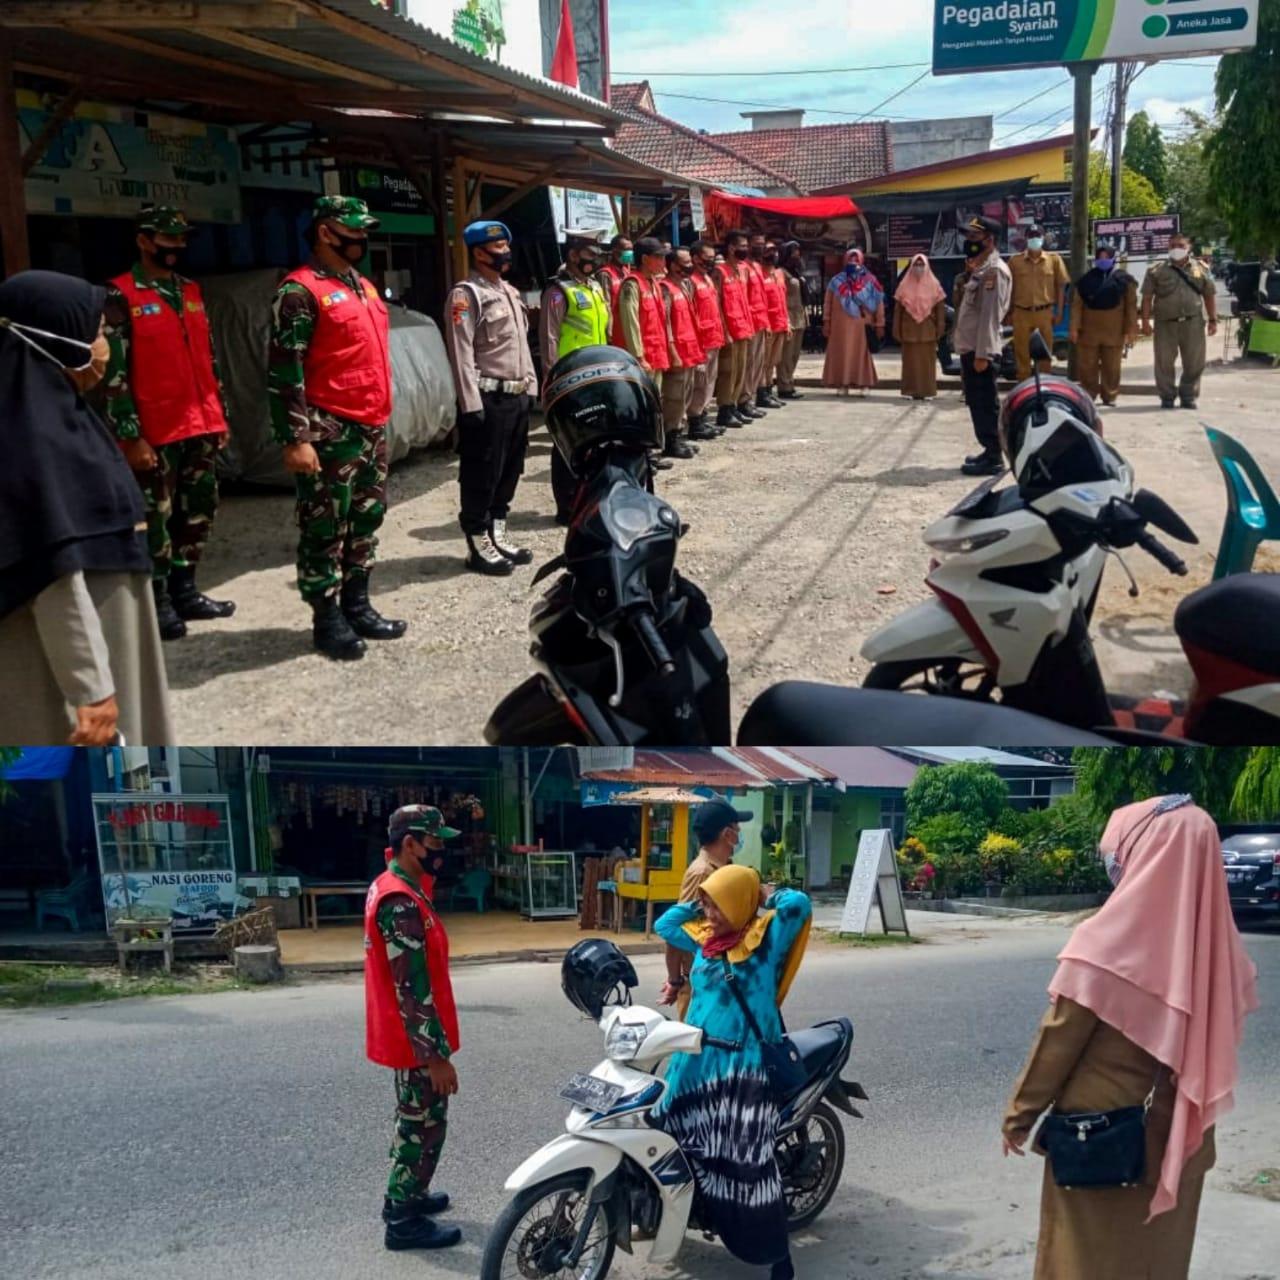 Operasi Yustisi Rutin, Puluhan Pelanggar Terjaring Tak Patuhi Prokes di Langsa